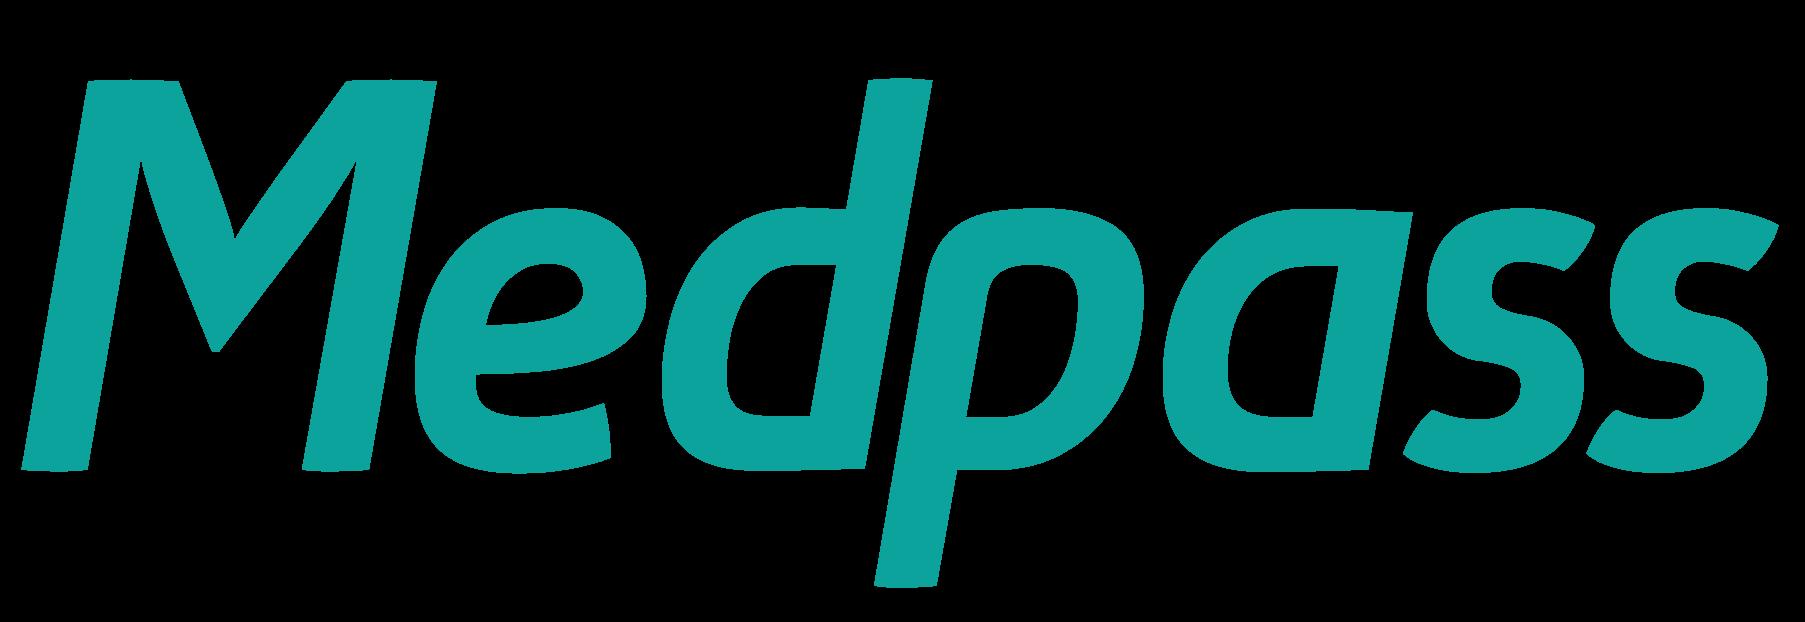 Medpass, medicina, tecnología, innovación, inversión, negocios, médicos, emprendimiento, hospitales, clínicas, Ecuador